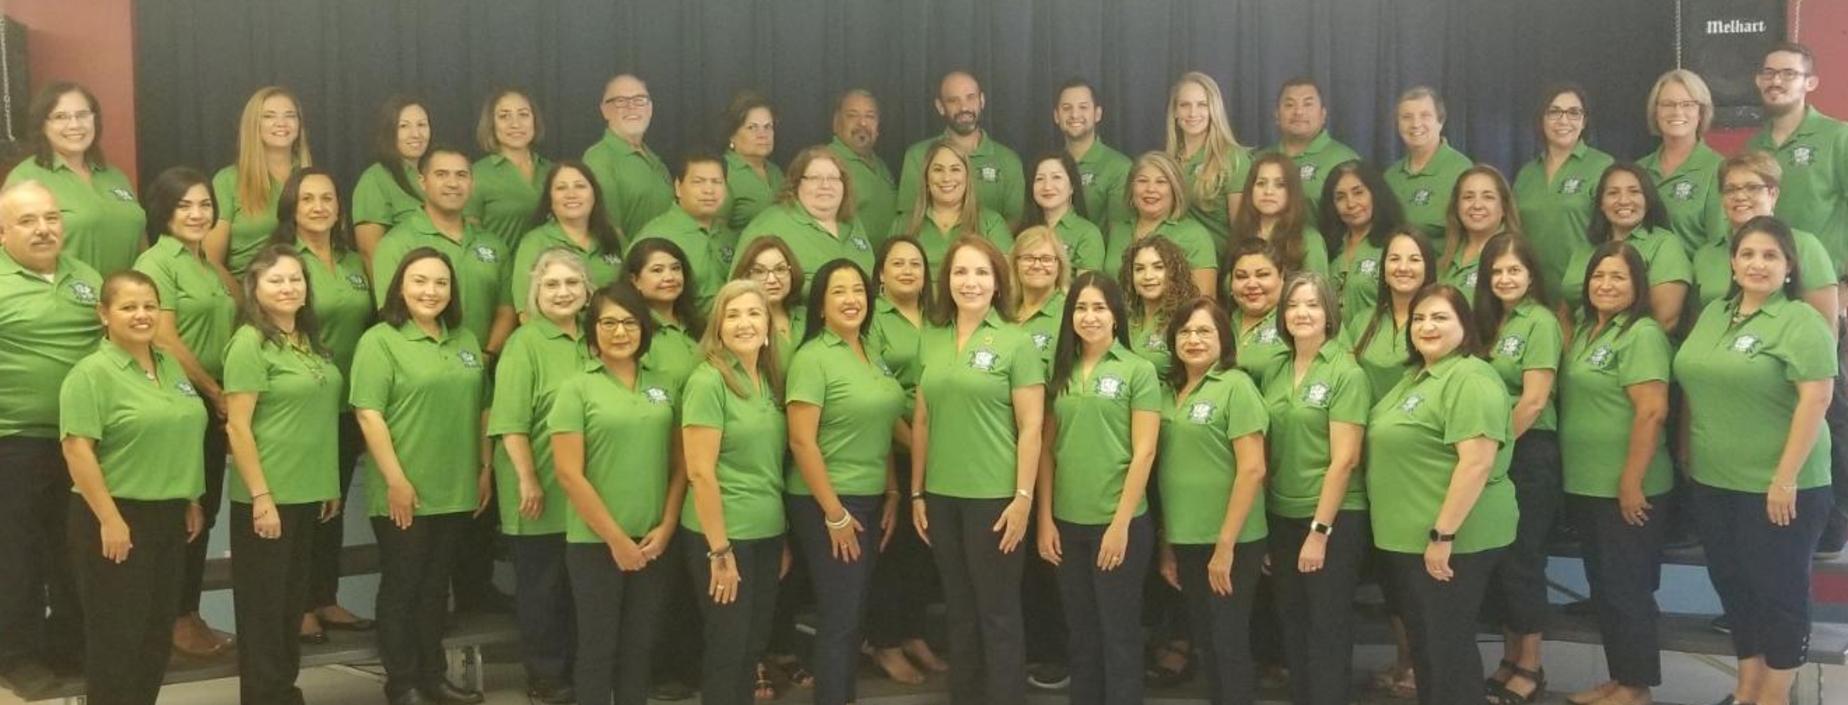 2019-2020 Staff Photo